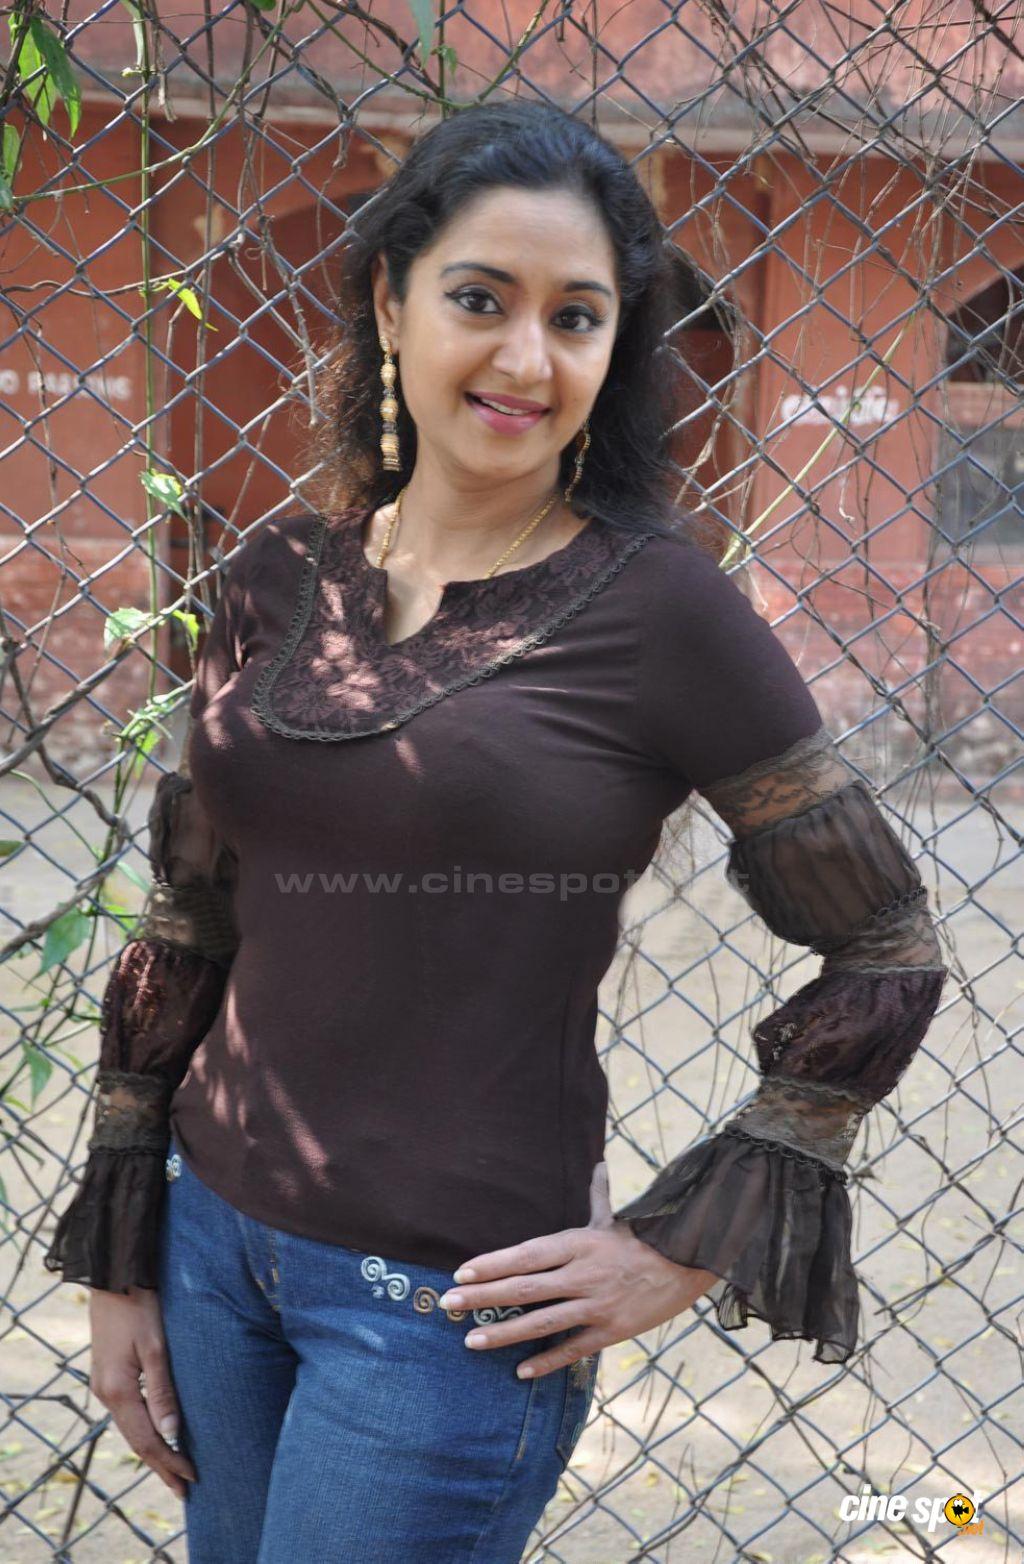 Unseen Tamil Actress Images Pics Hot Charmila Malayalam -5707